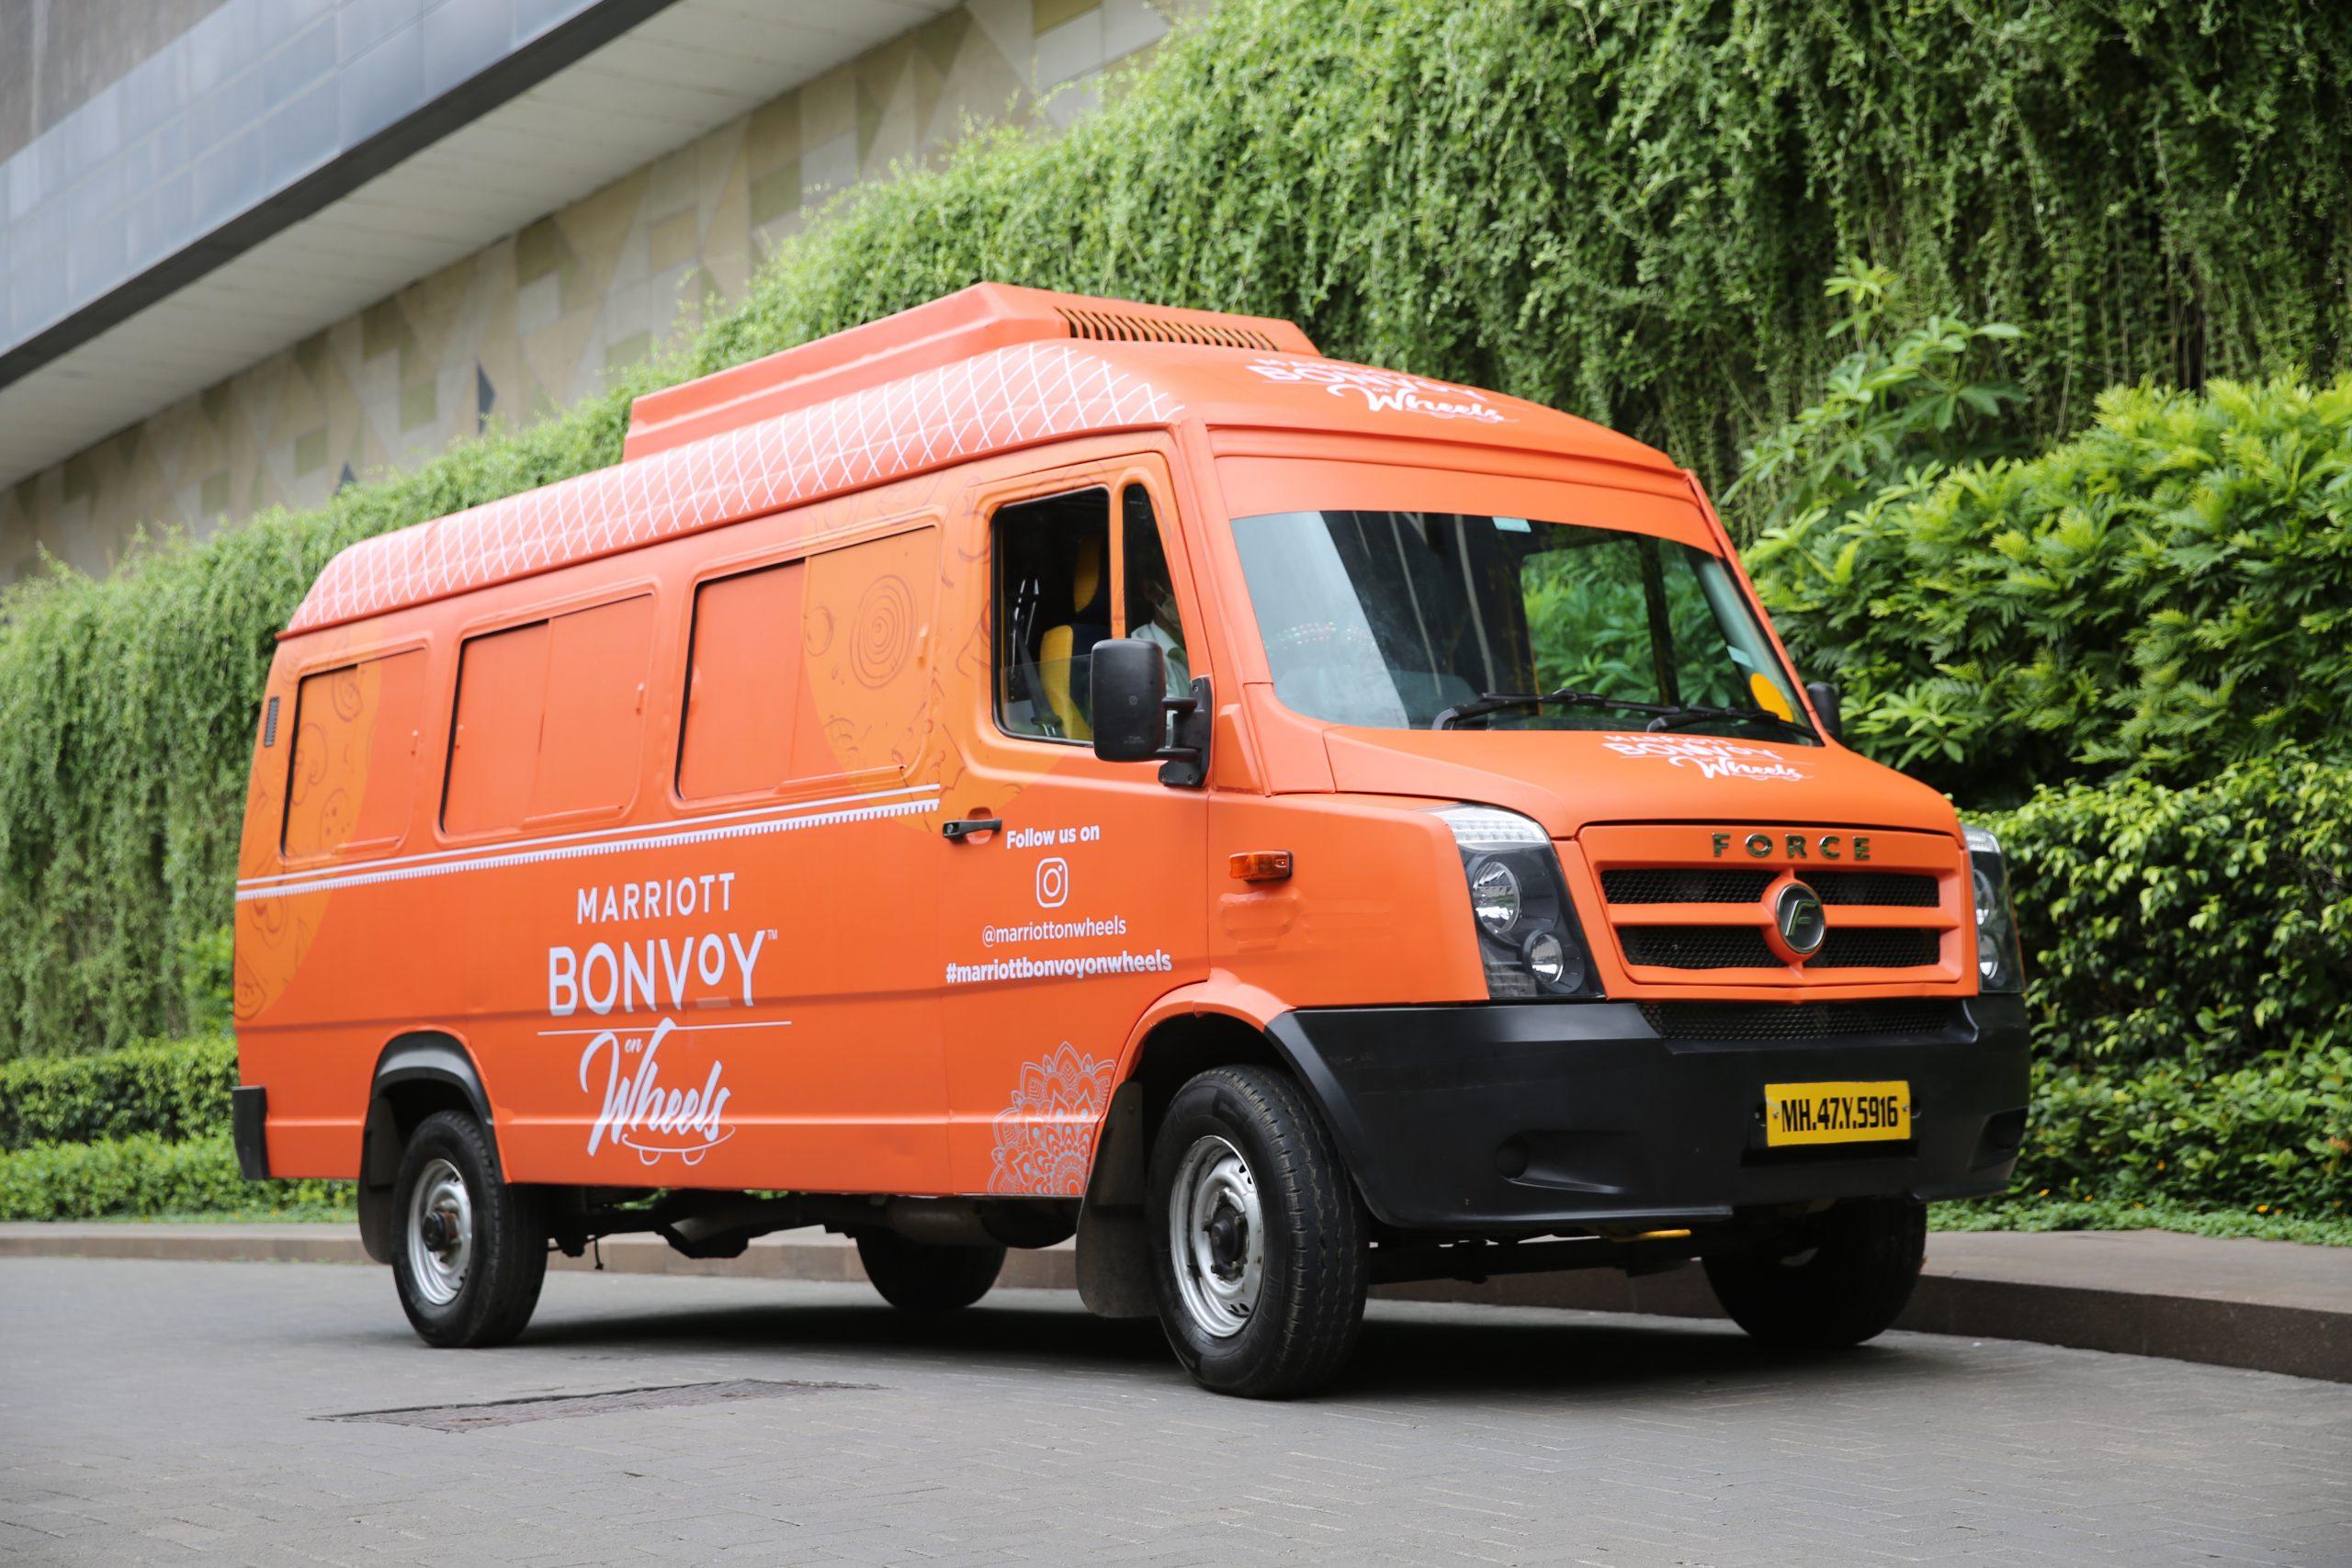 Marriott Bonvoy on Wheels